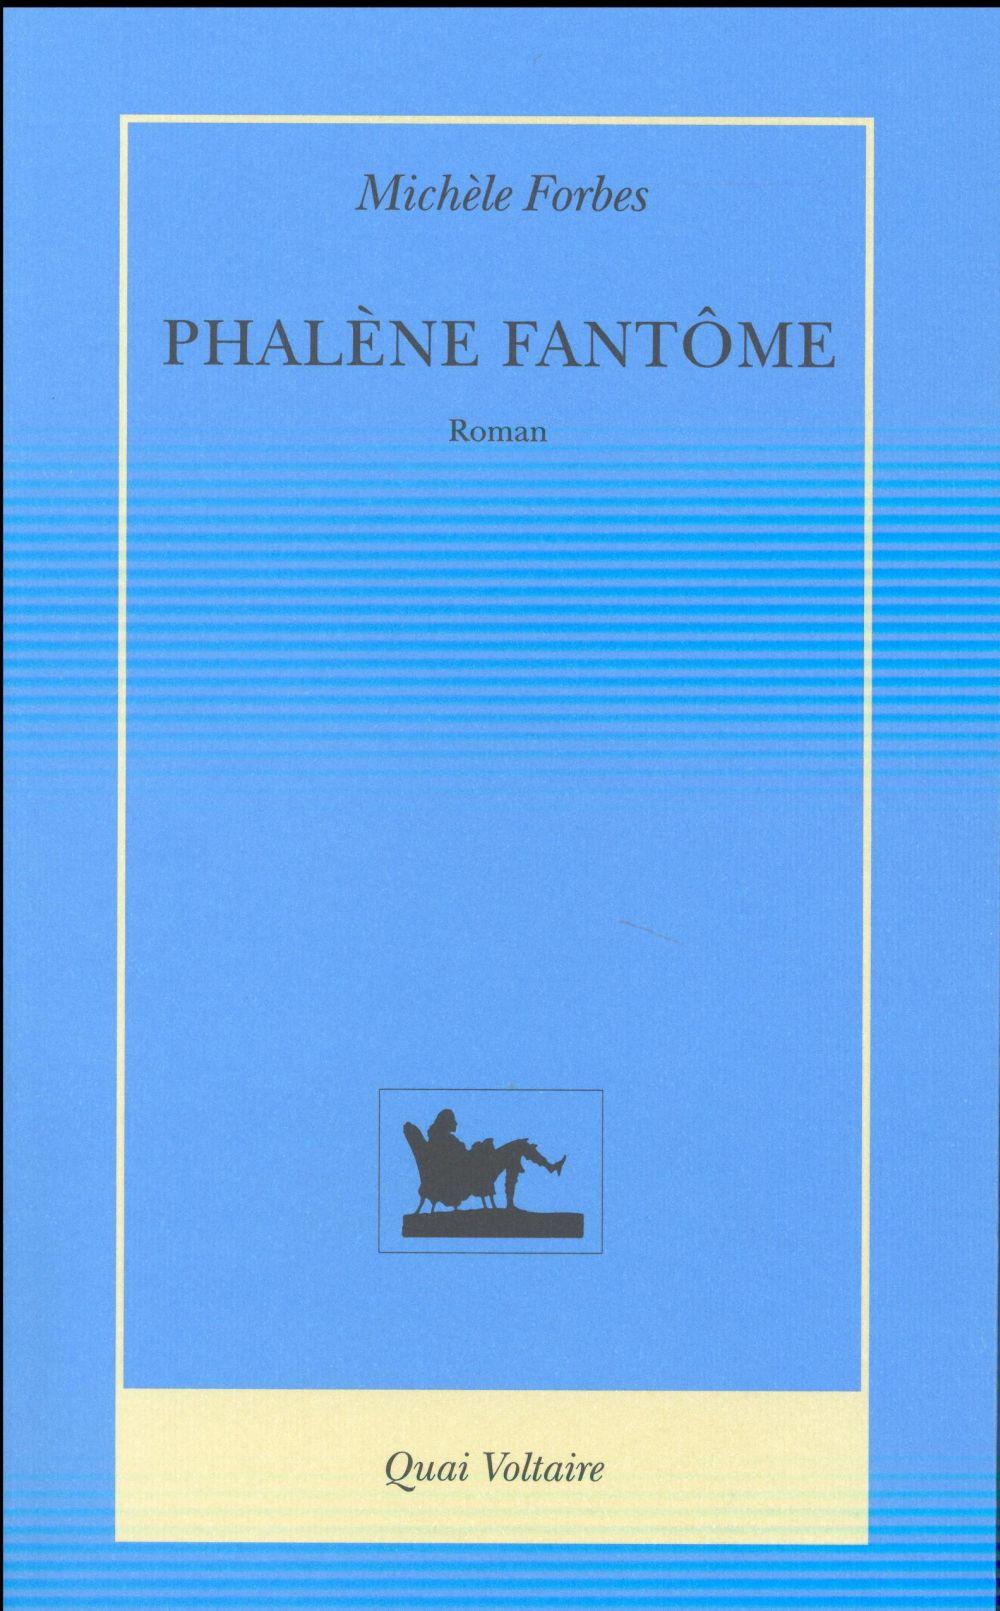 PHALENE FANTOME